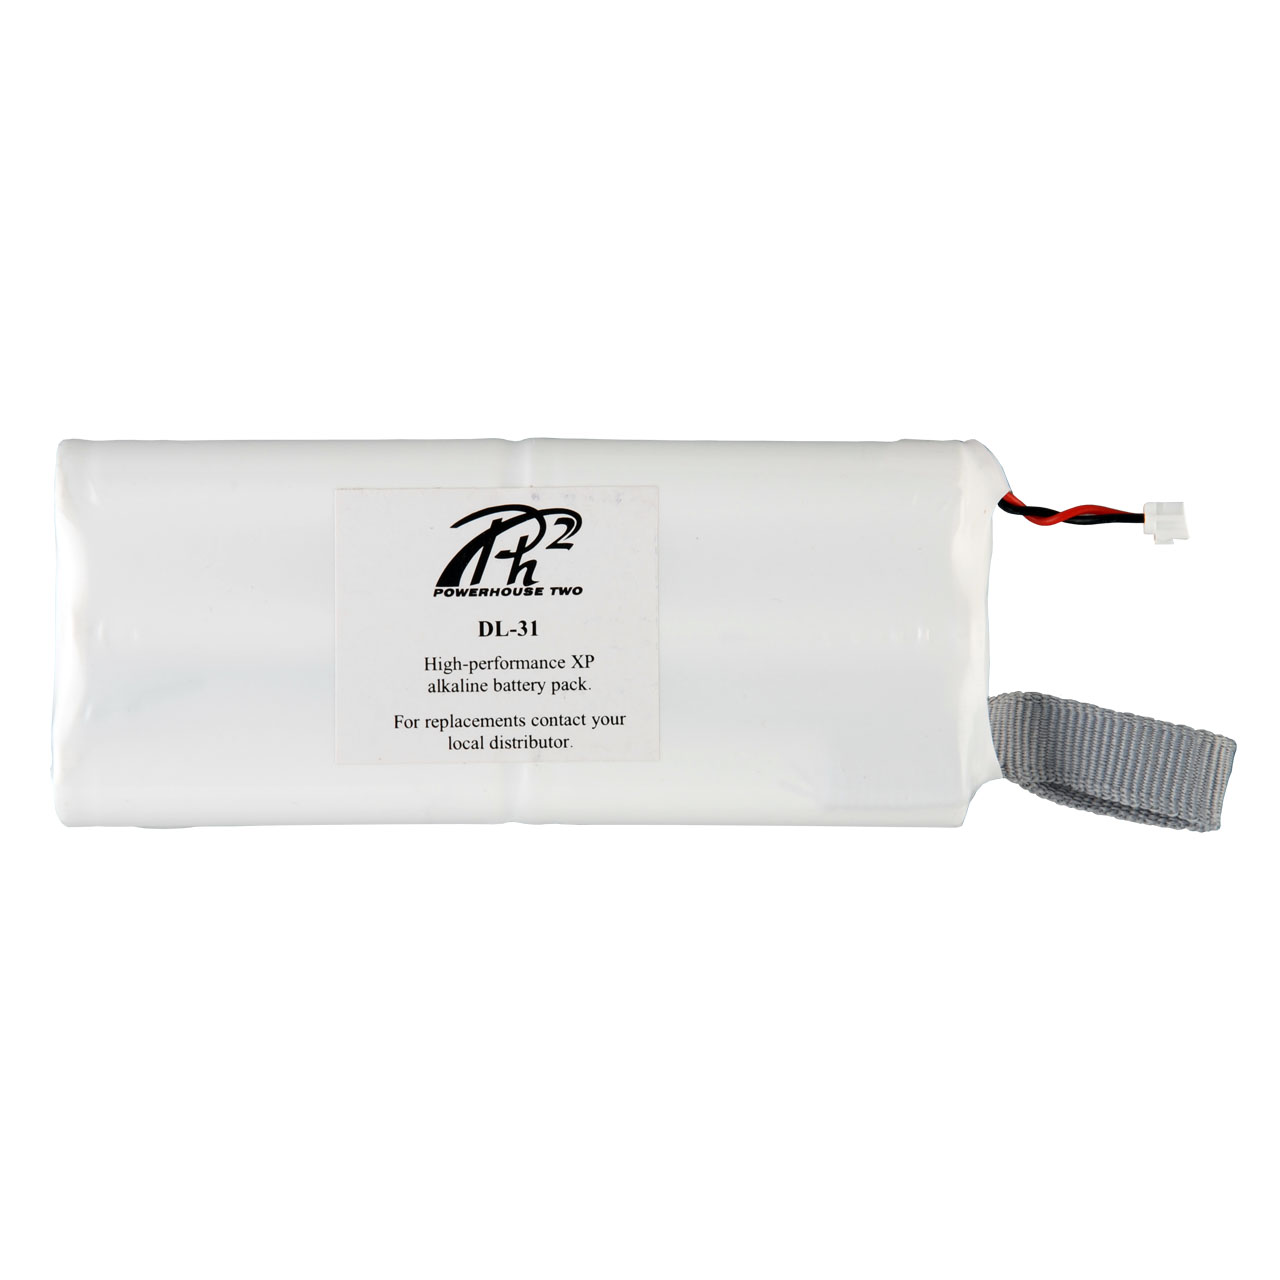 DL-31 Hospitality Battery Pack